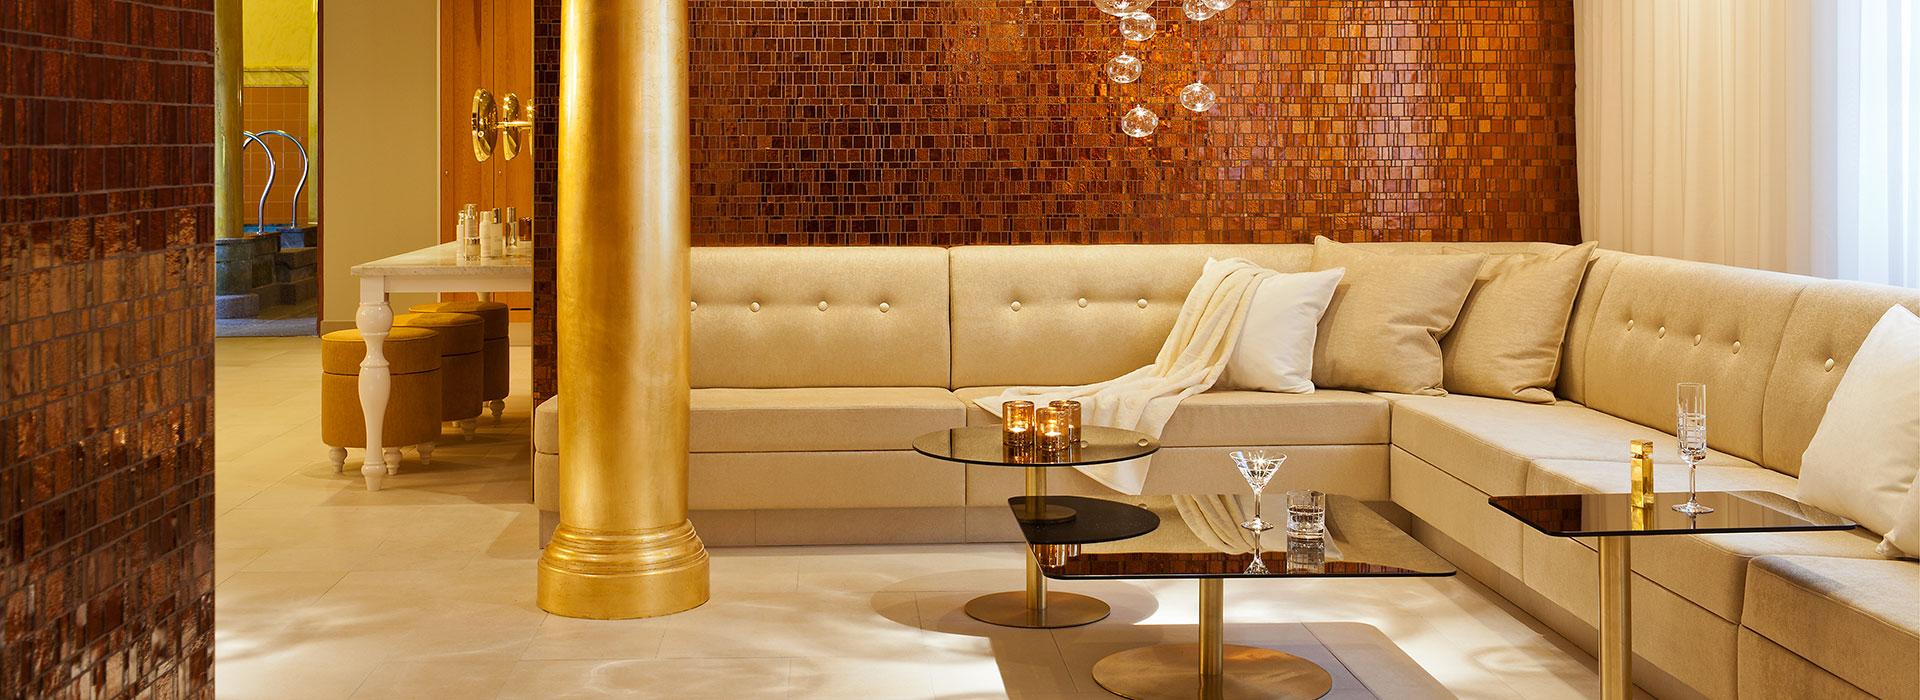 turken_lounge